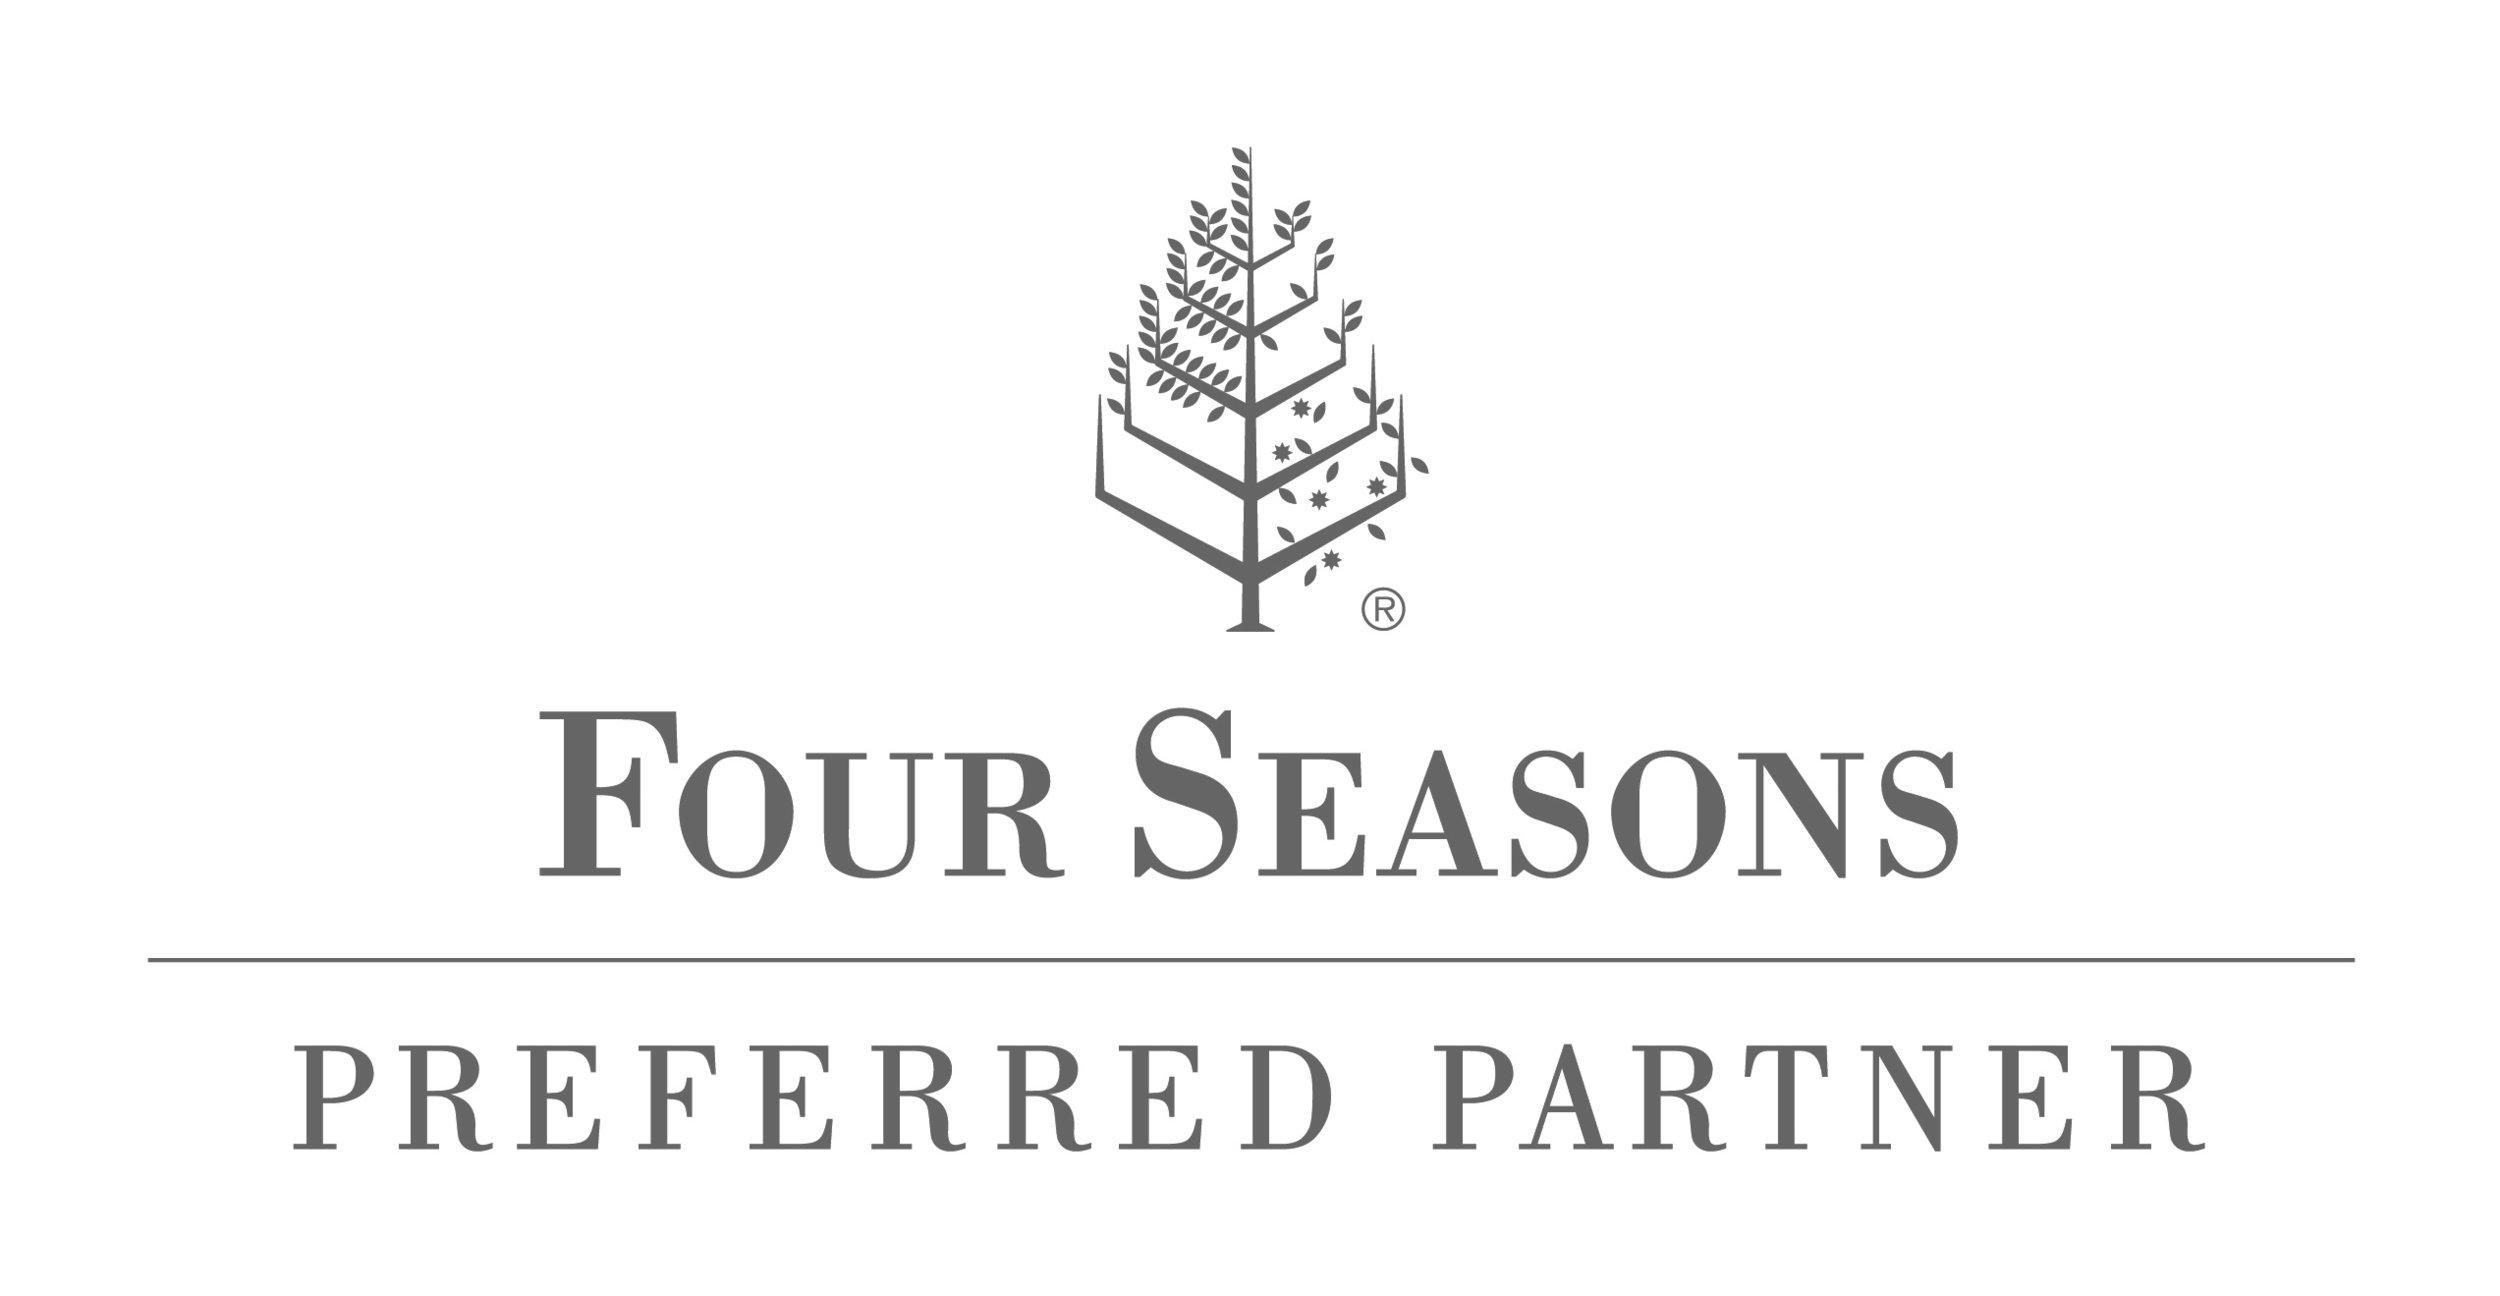 Four-Seasons-Preferred-Partners copy.jpg